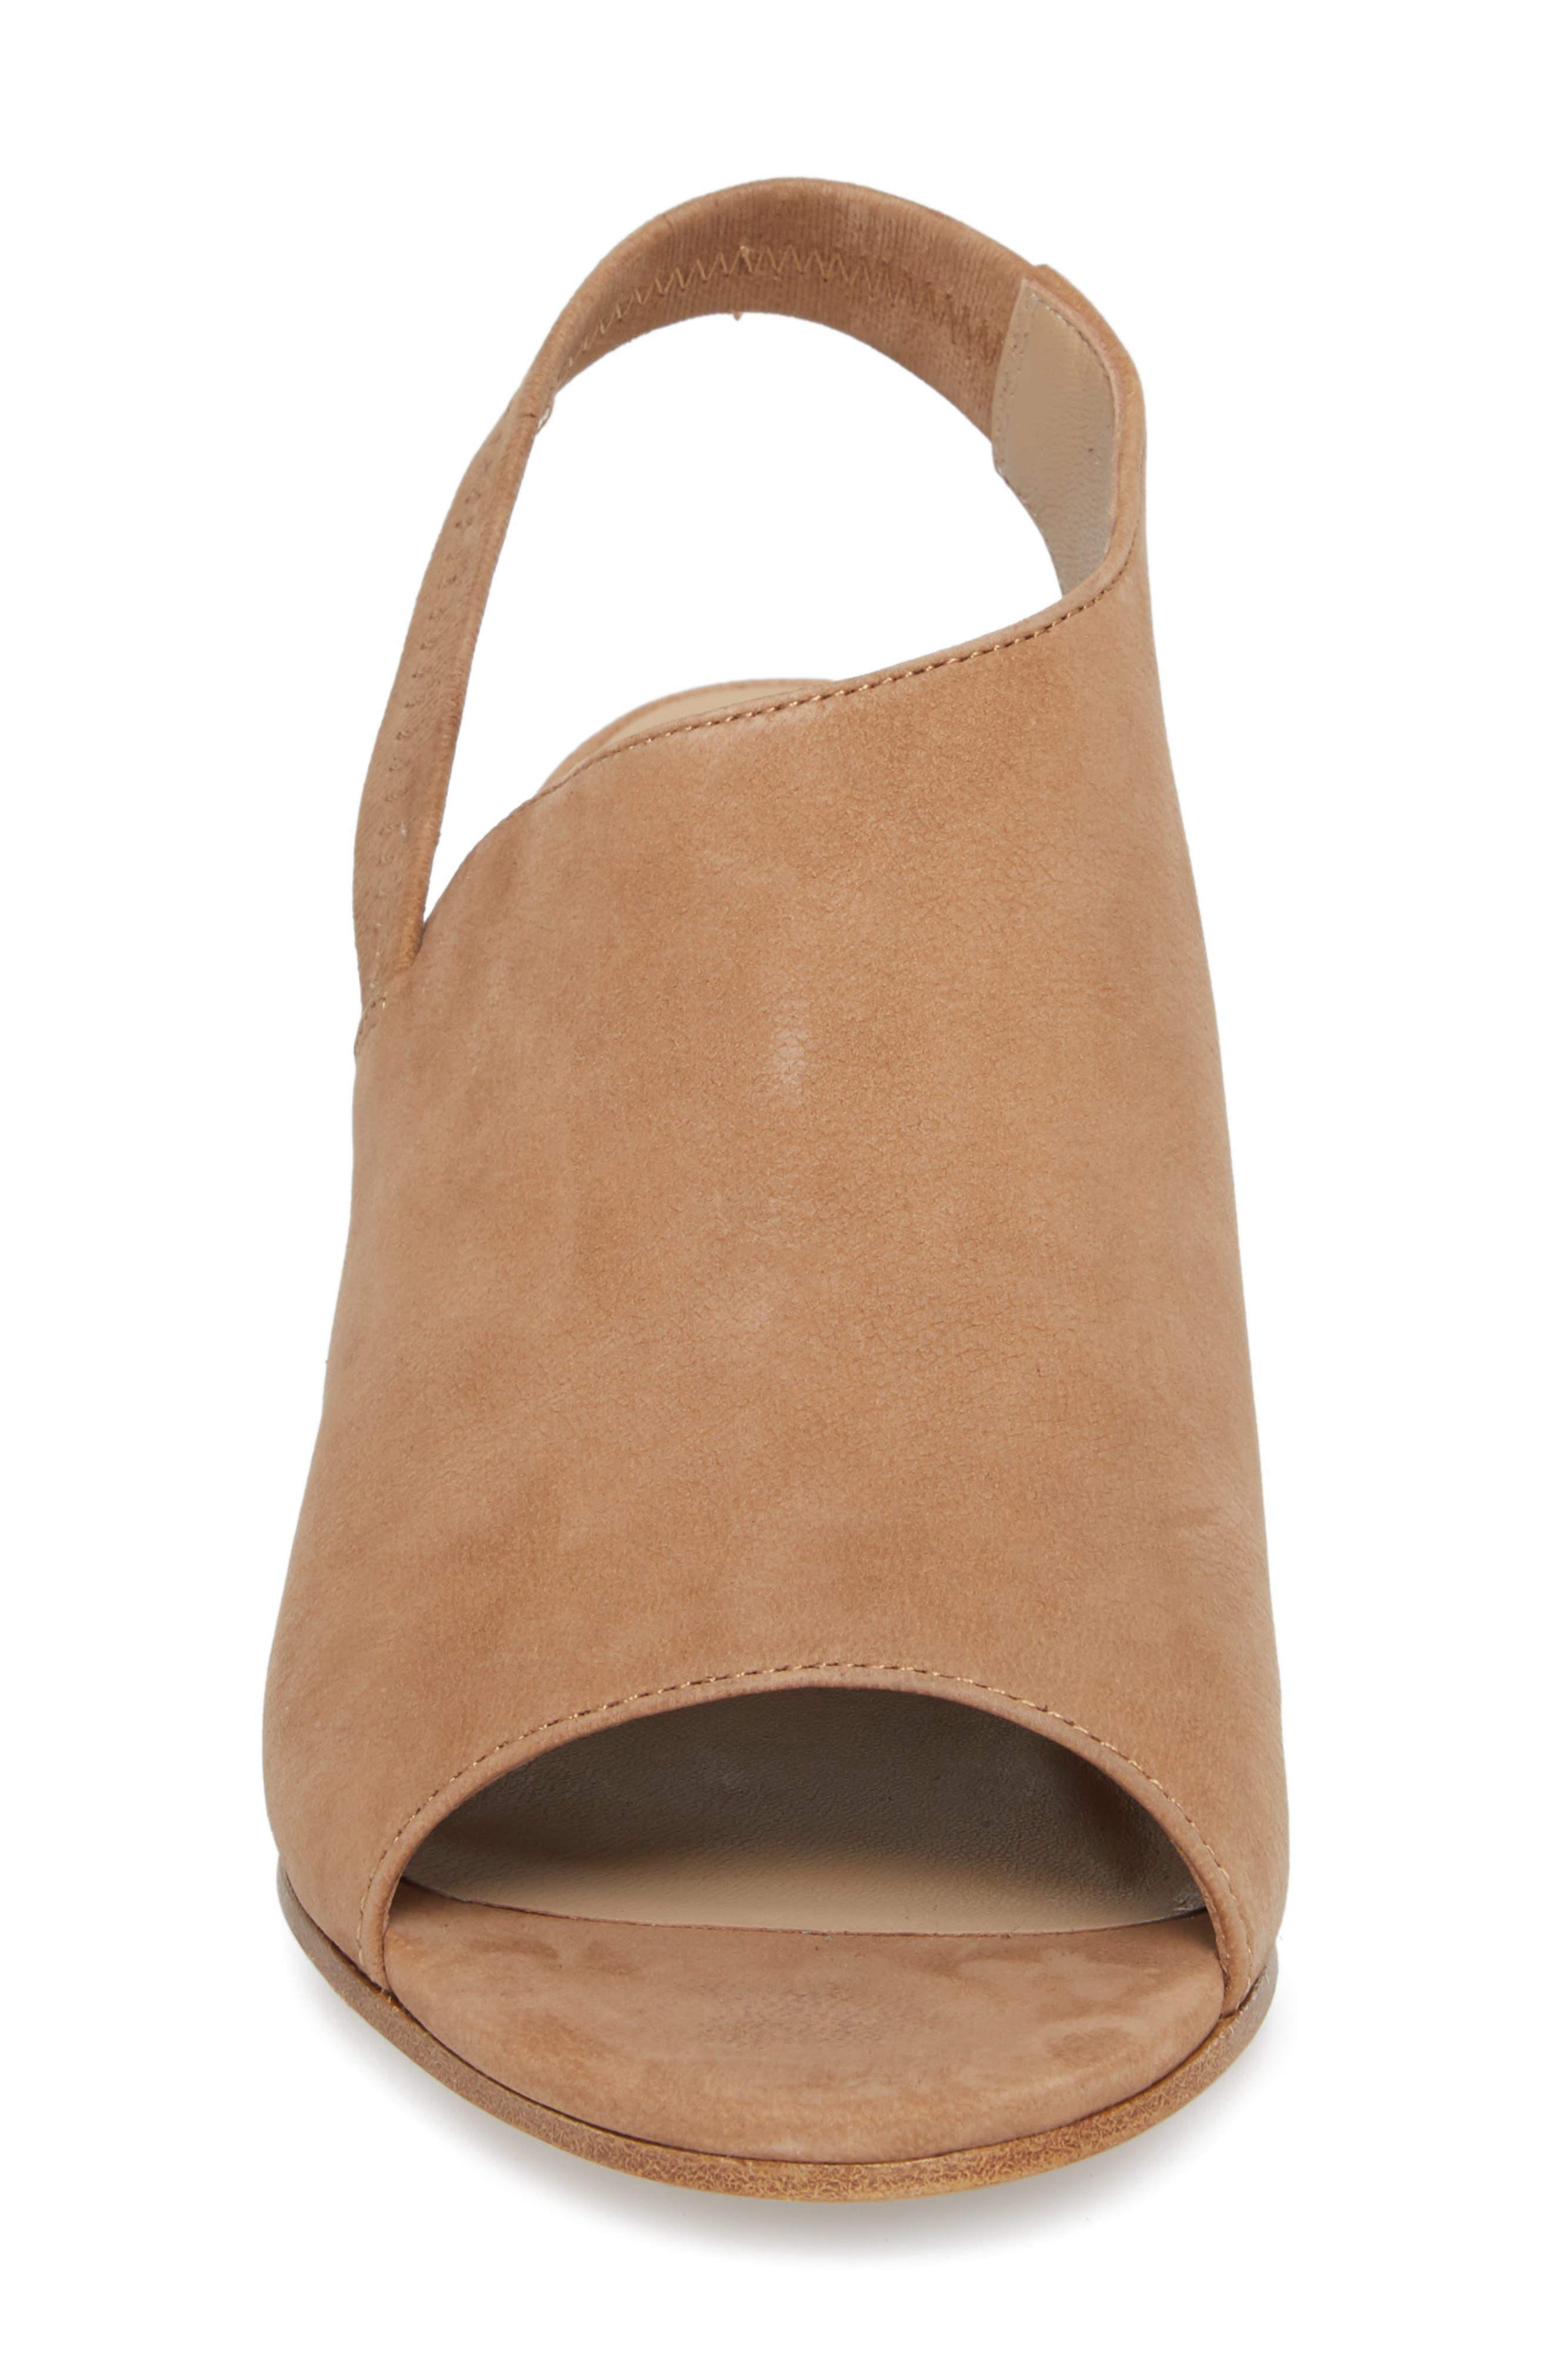 Leigh Asymmetrical Slingback Sandal,                             Alternate thumbnail 5, color,                             Wheat Leather